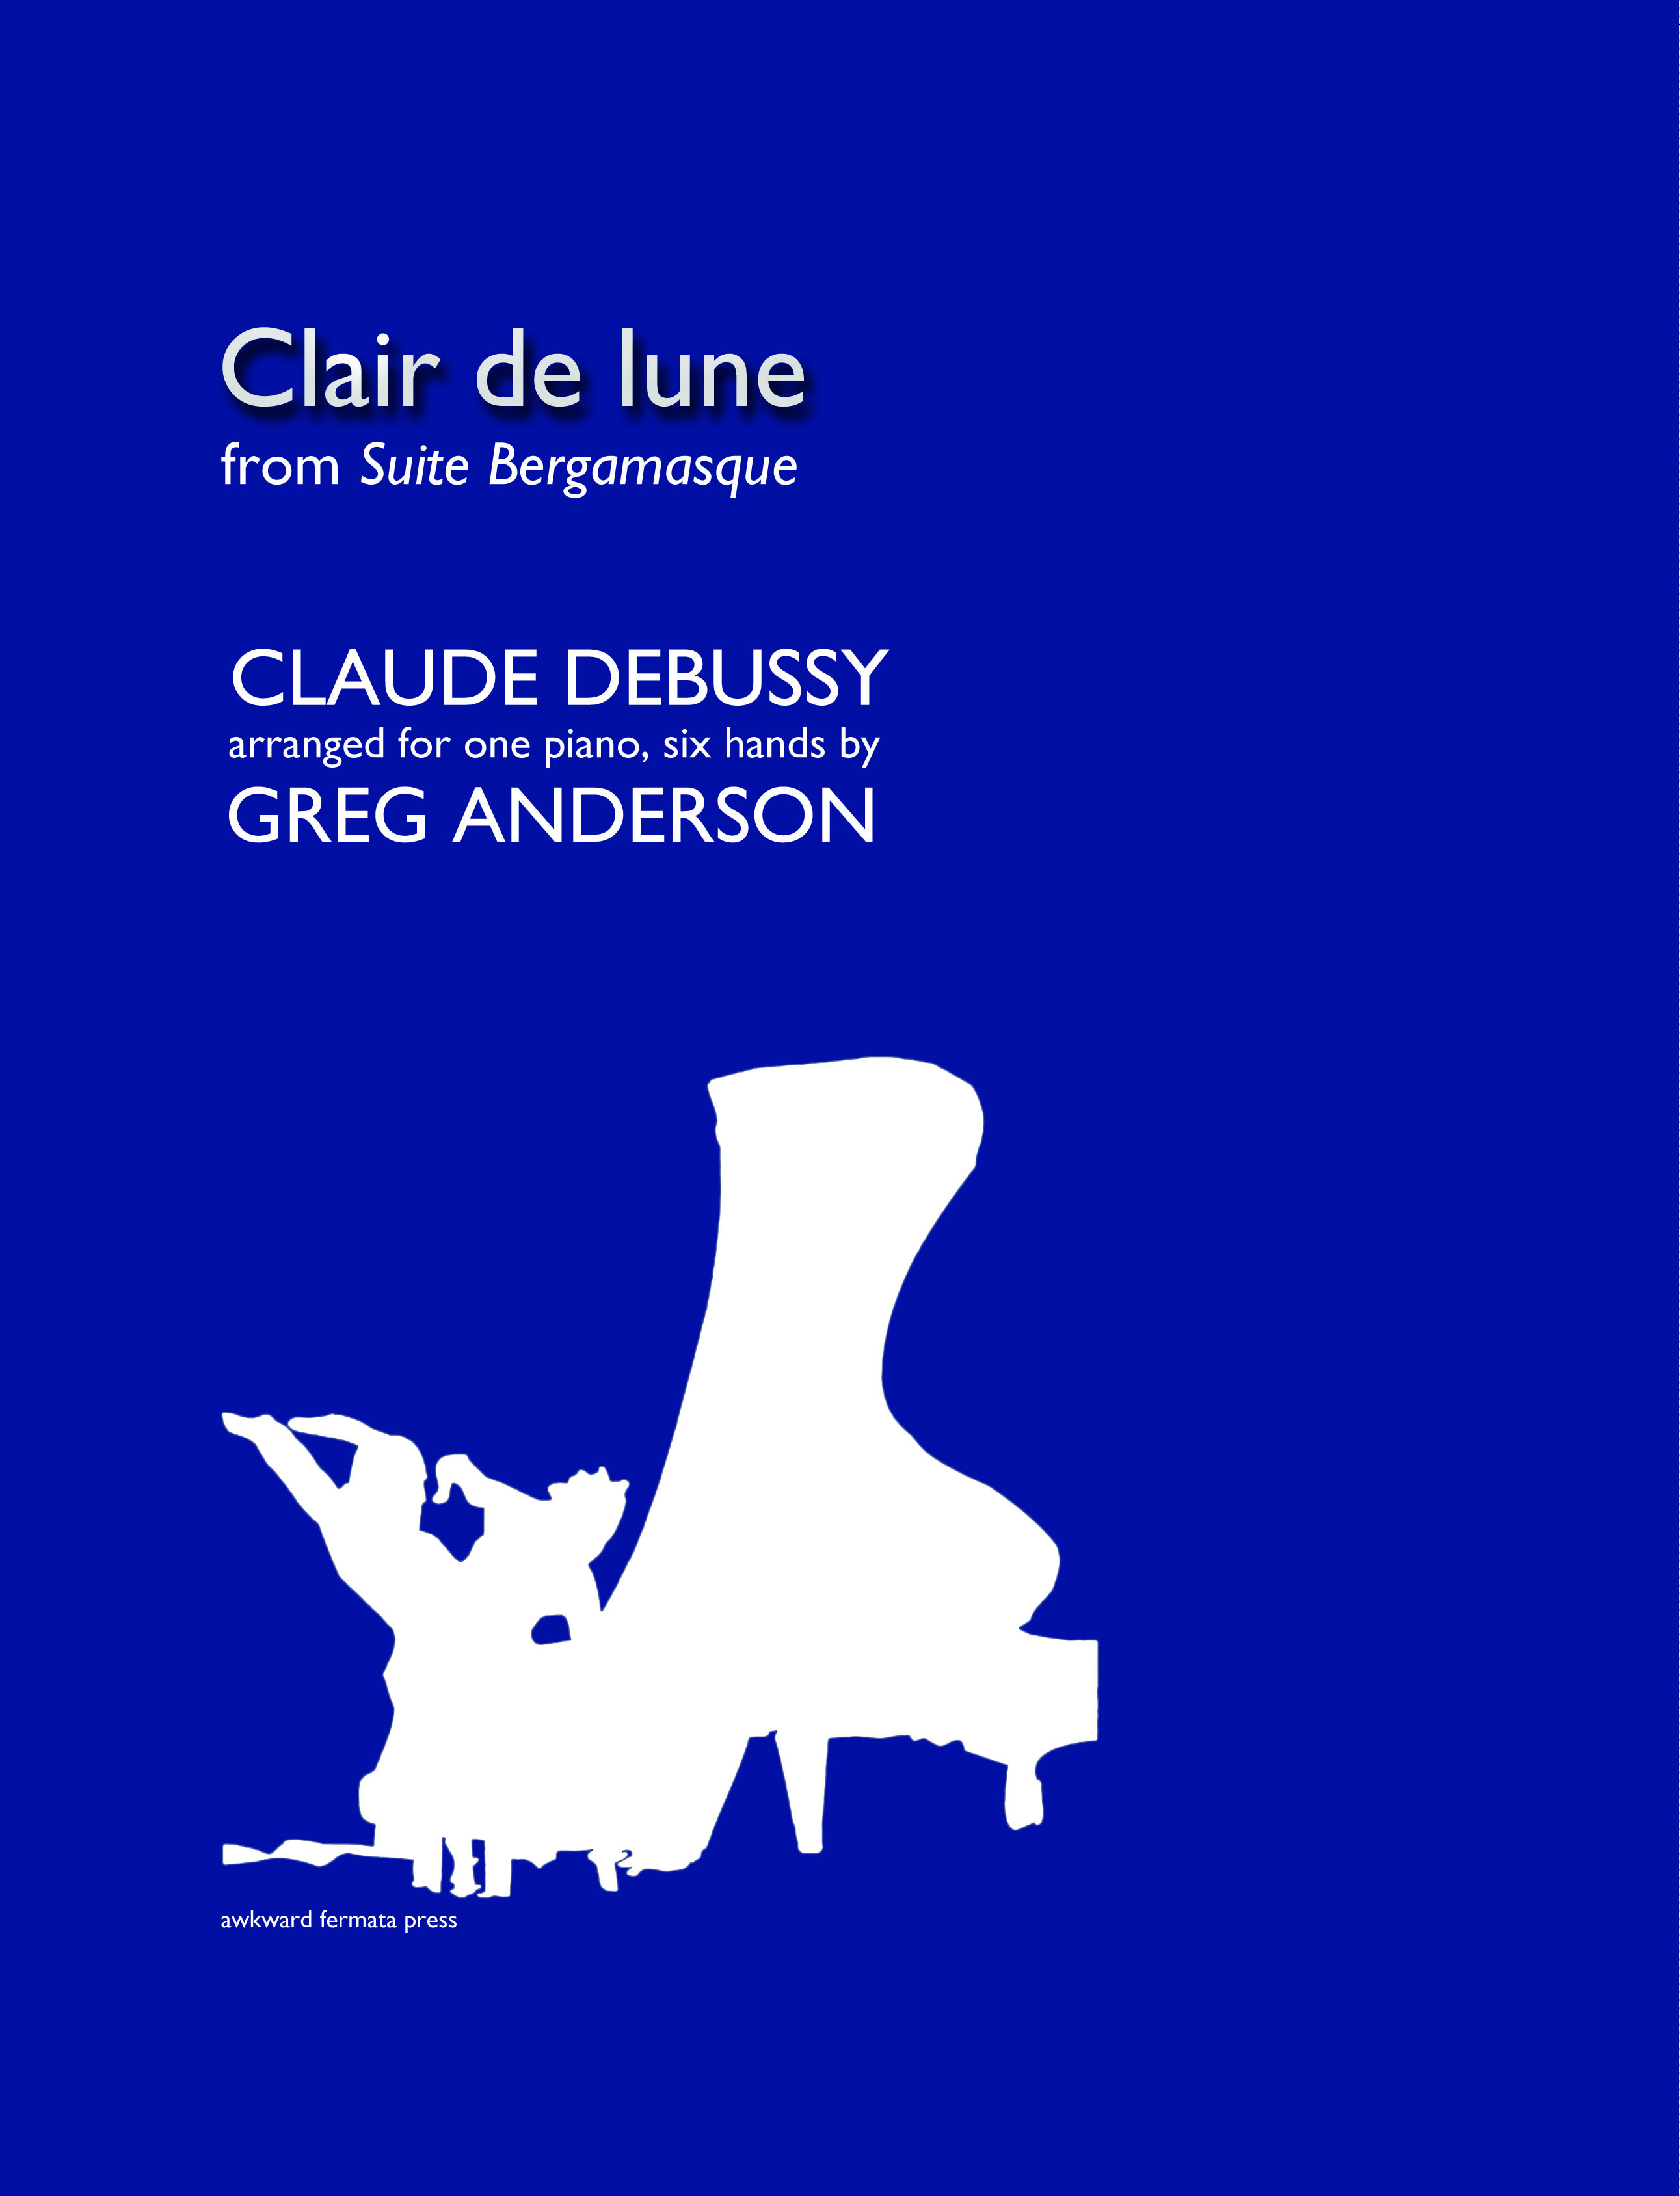 DEBUSSY: Clair de lune (6 hands) — GREG ANDERSON concert pianist